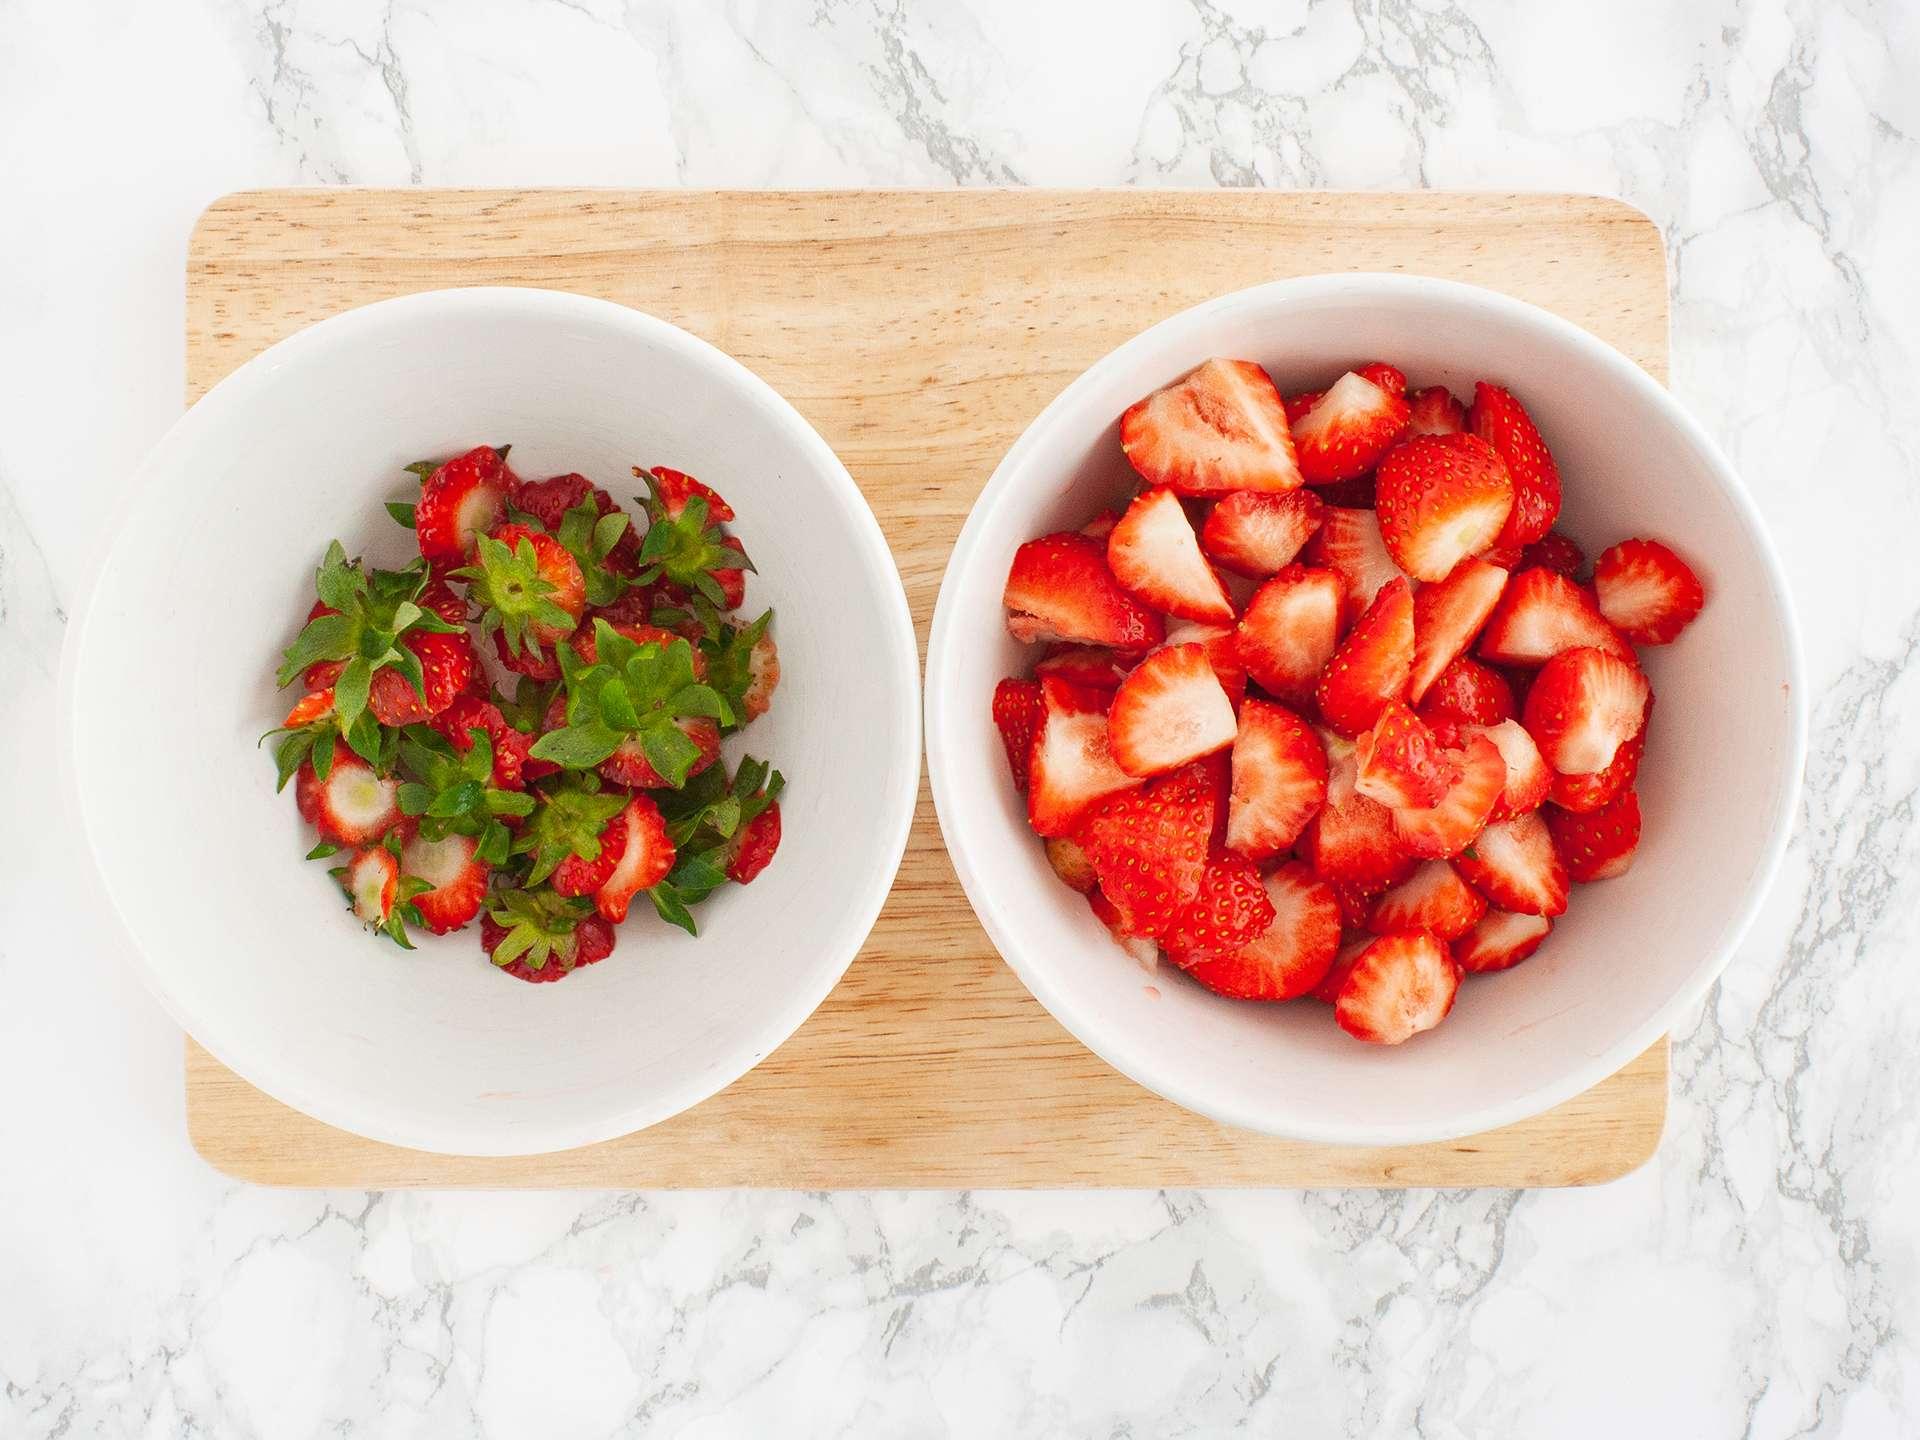 Step 1.1 of Sugar Free Strawberry Jam without Pectin